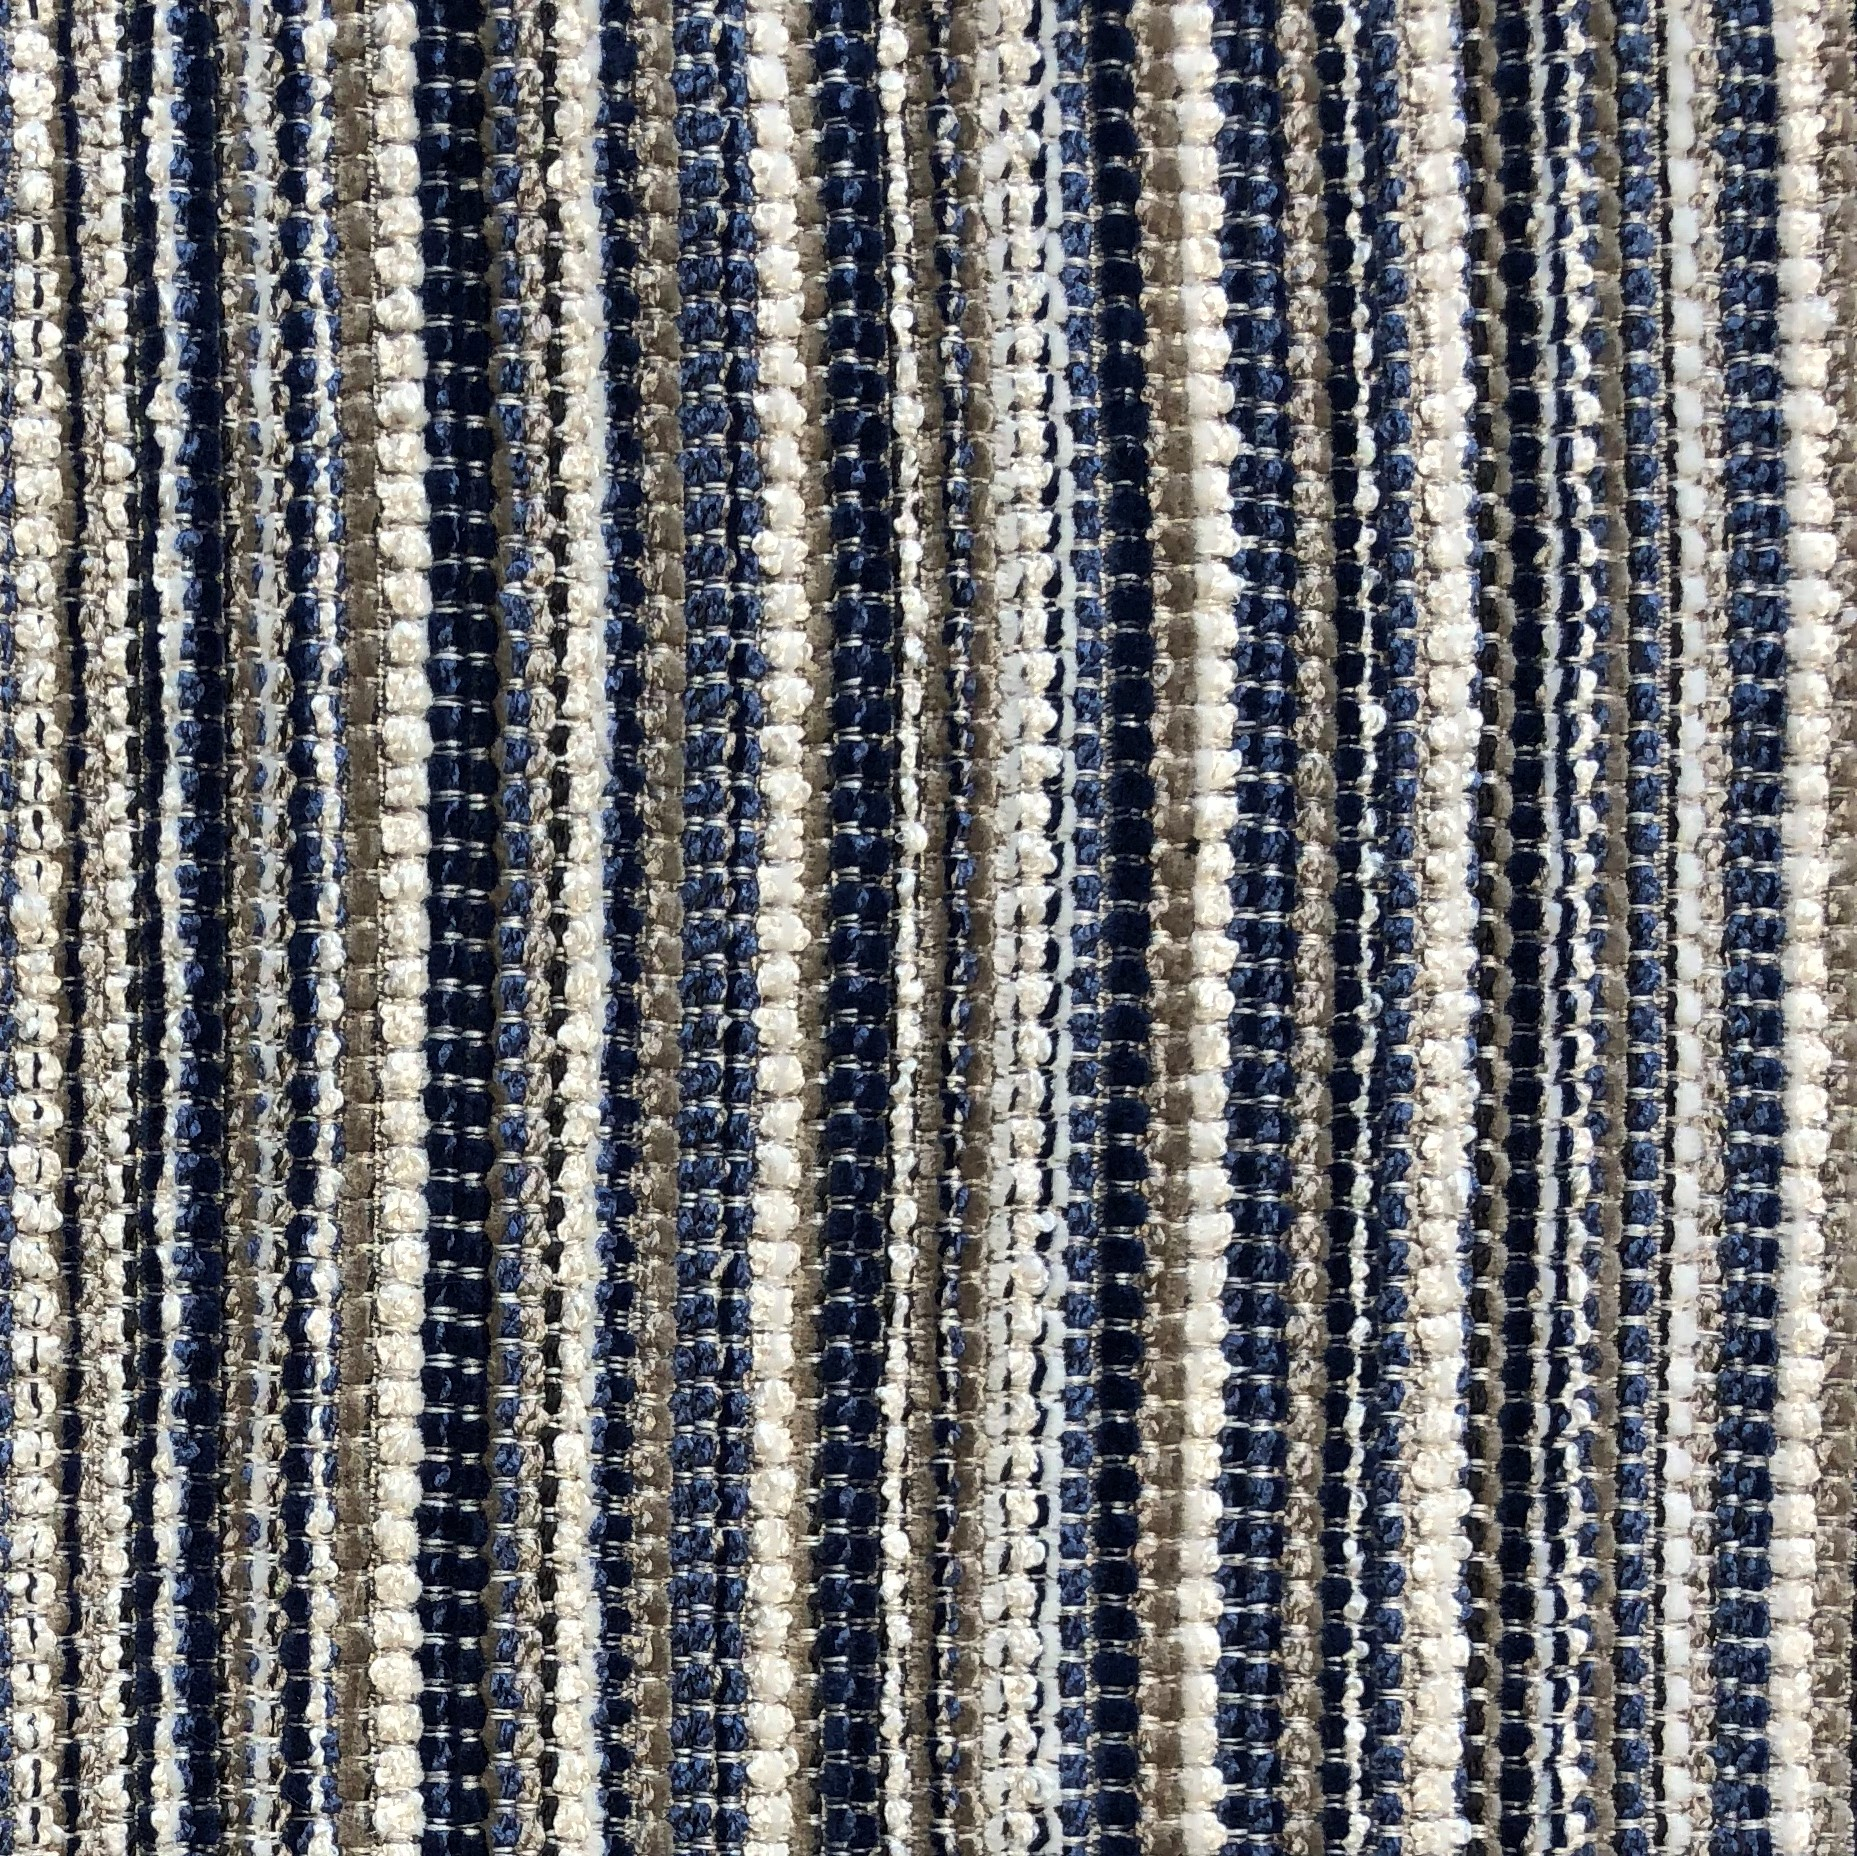 Plutus PBKR1933-2030-DP New Hampton Ivory & Blue Luxury Throw Pillow, 20 x 30 in. Queen - image 2 de 3